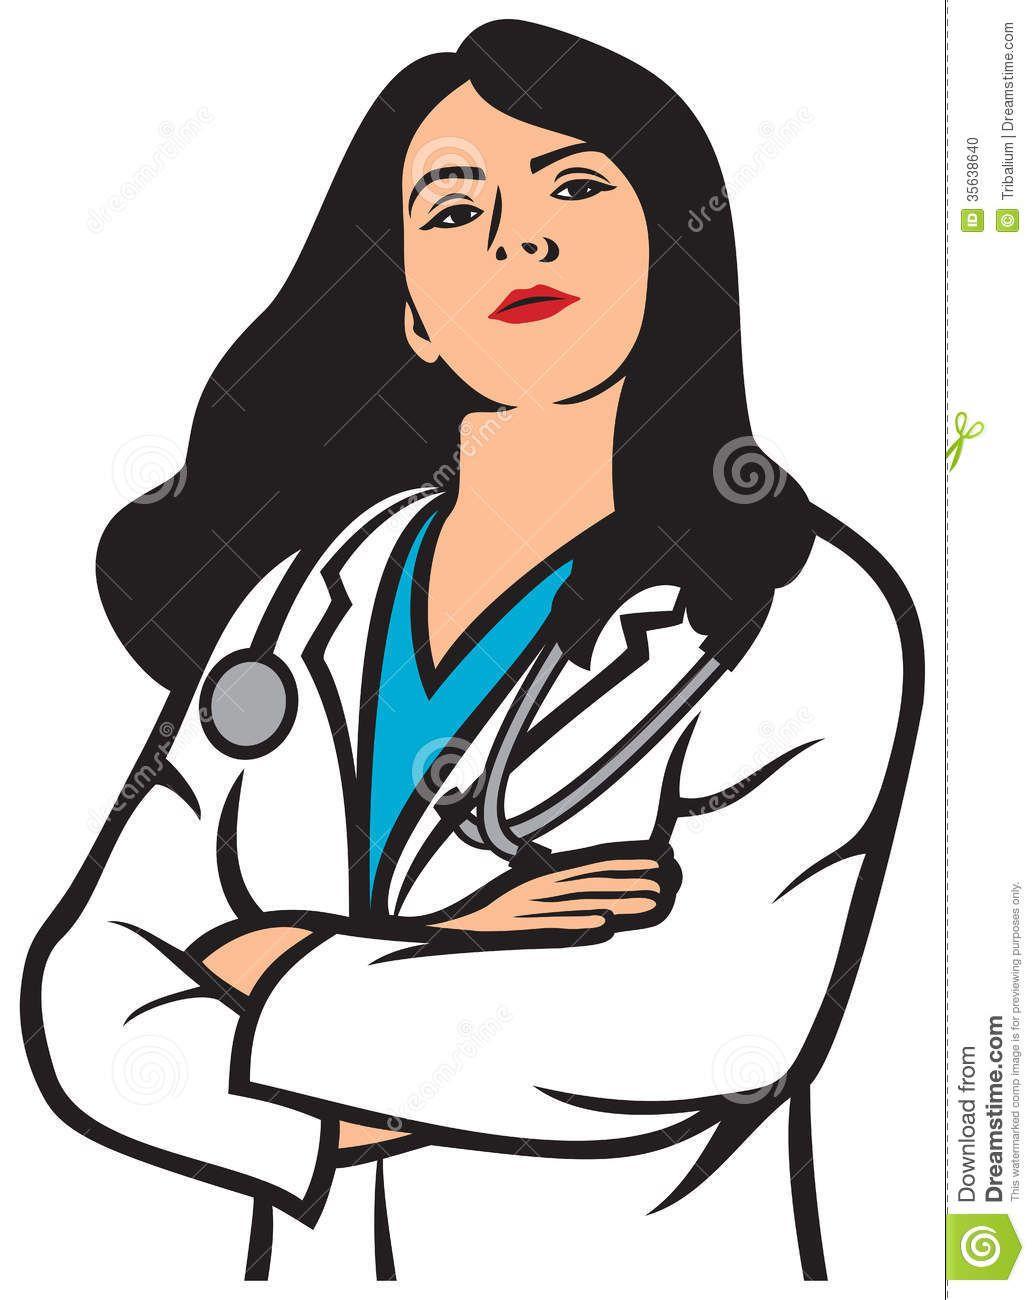 women doctors clipart doctor clip art woman doctor sign rh pinterest ca doctor clip art free clip art medical doctor clipart free